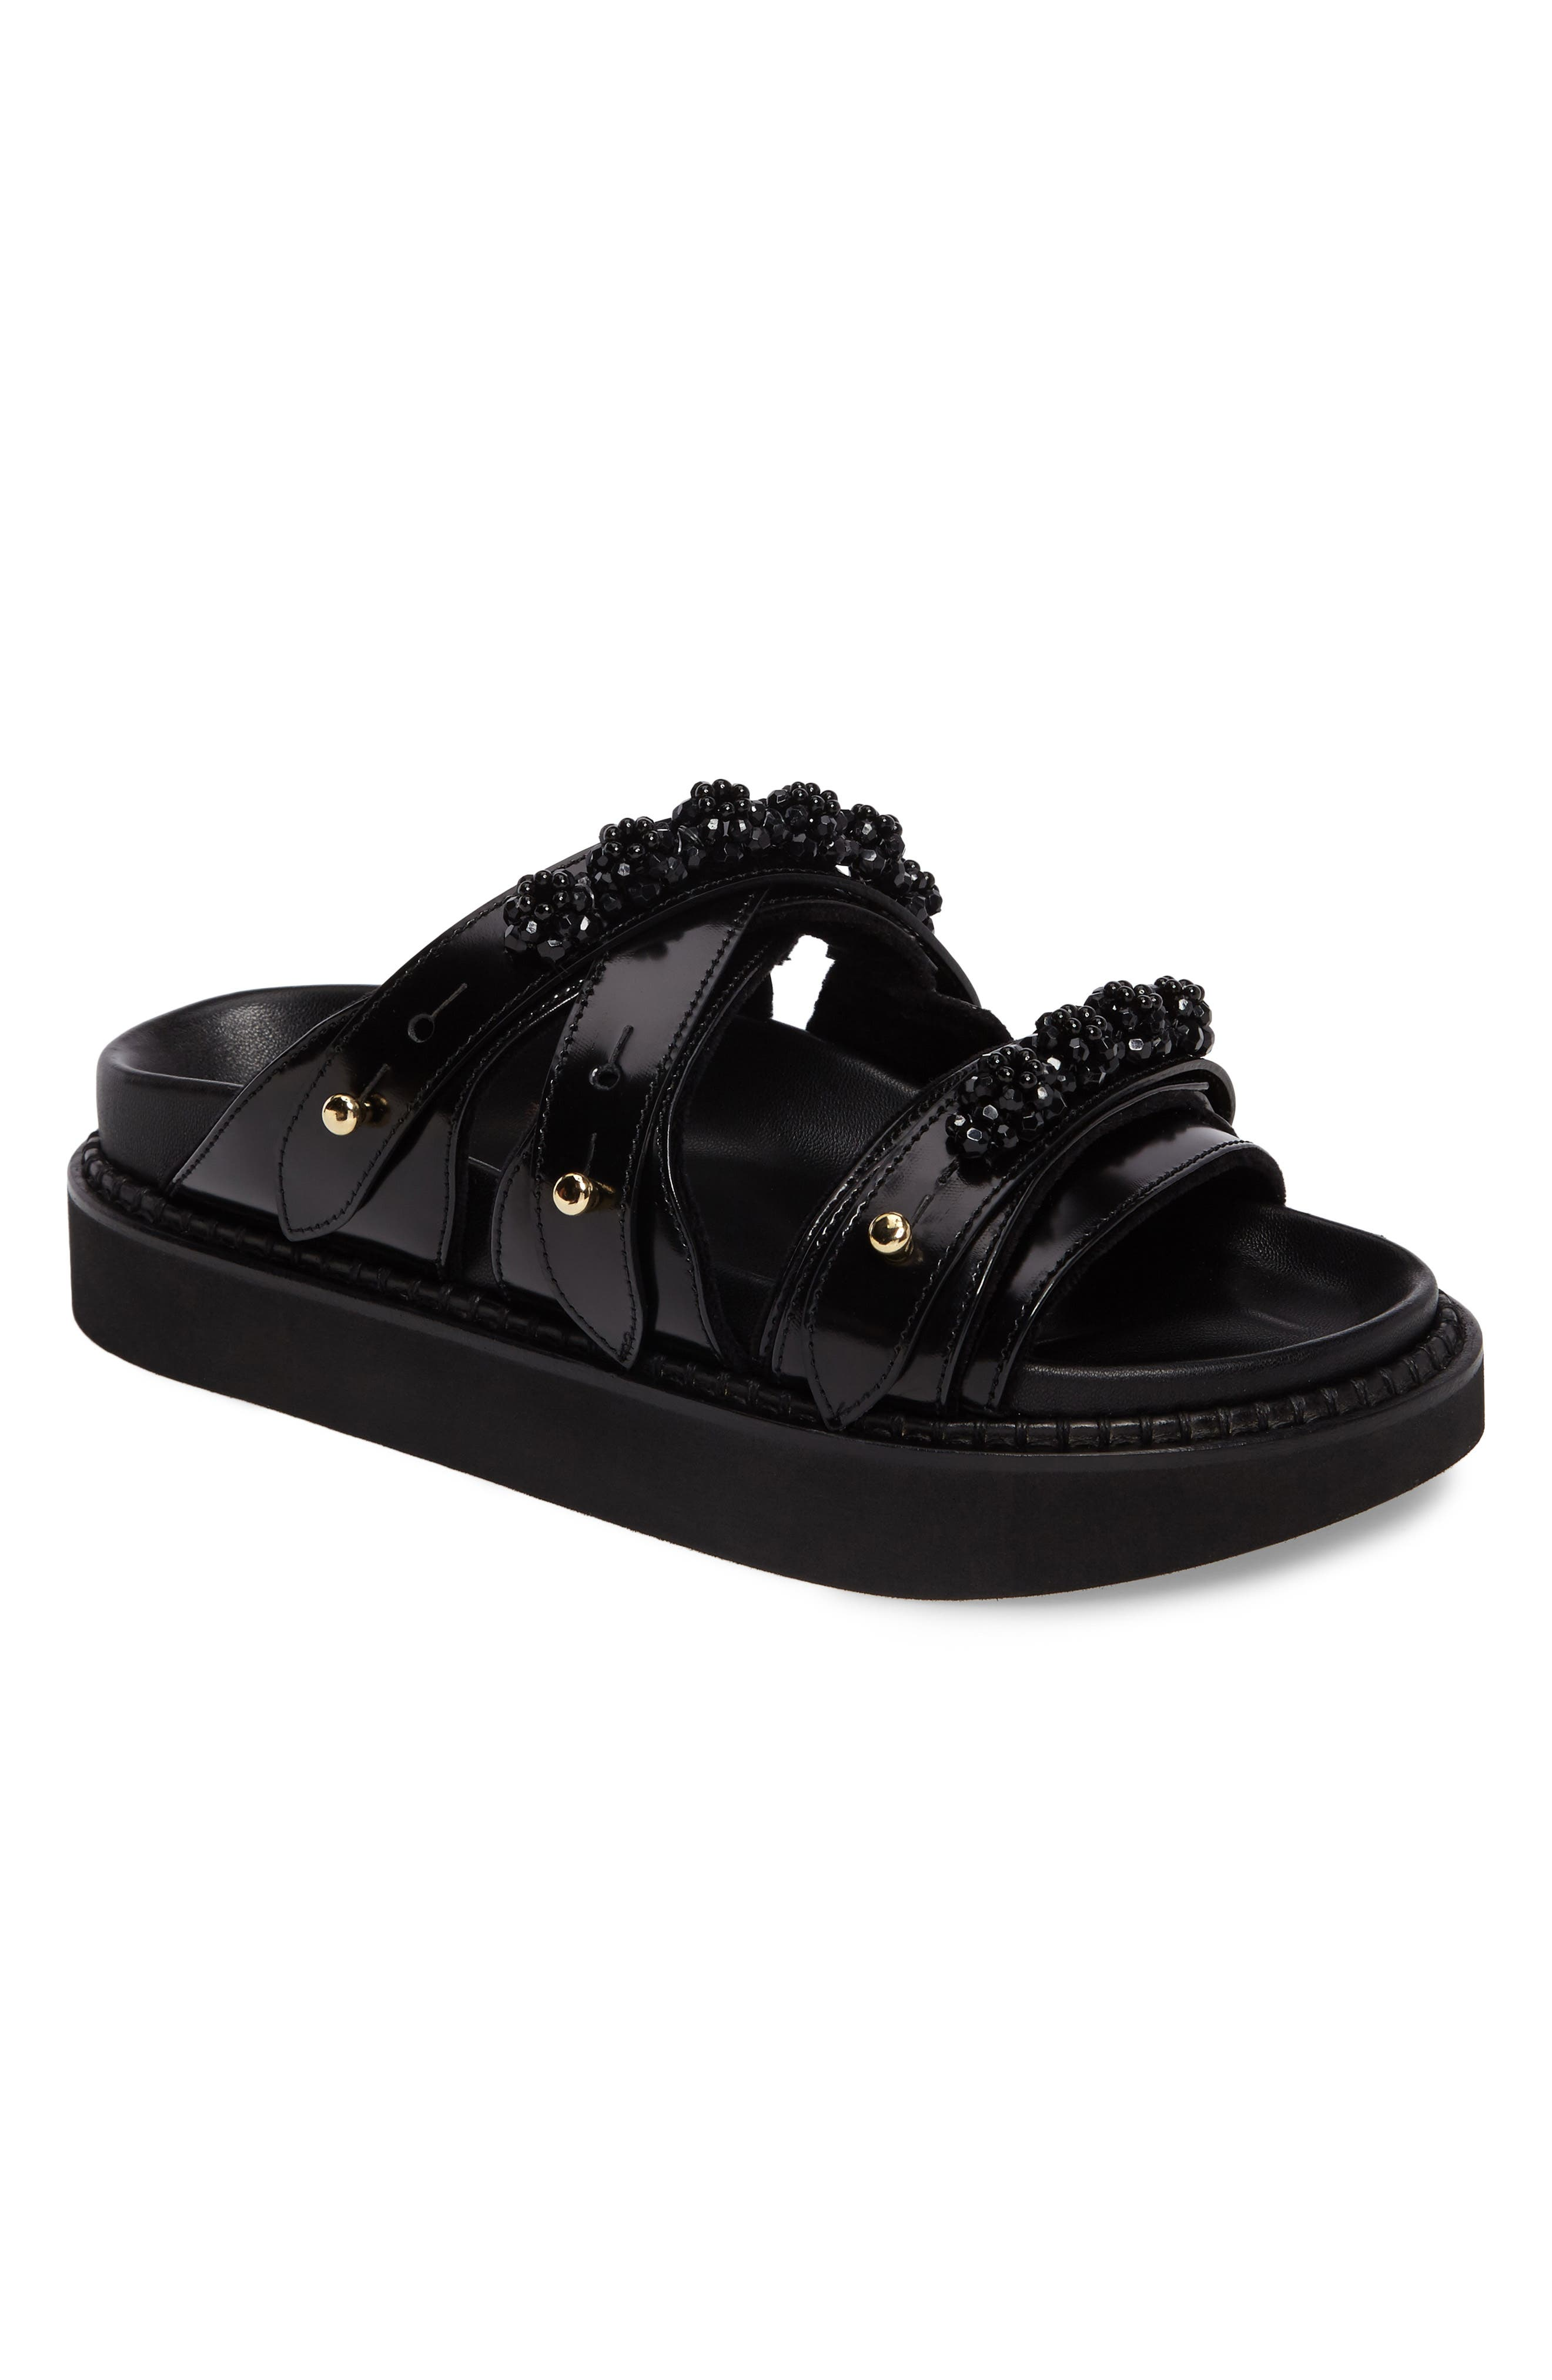 Beaded Leather Slide Sandal,                             Main thumbnail 1, color,                             001